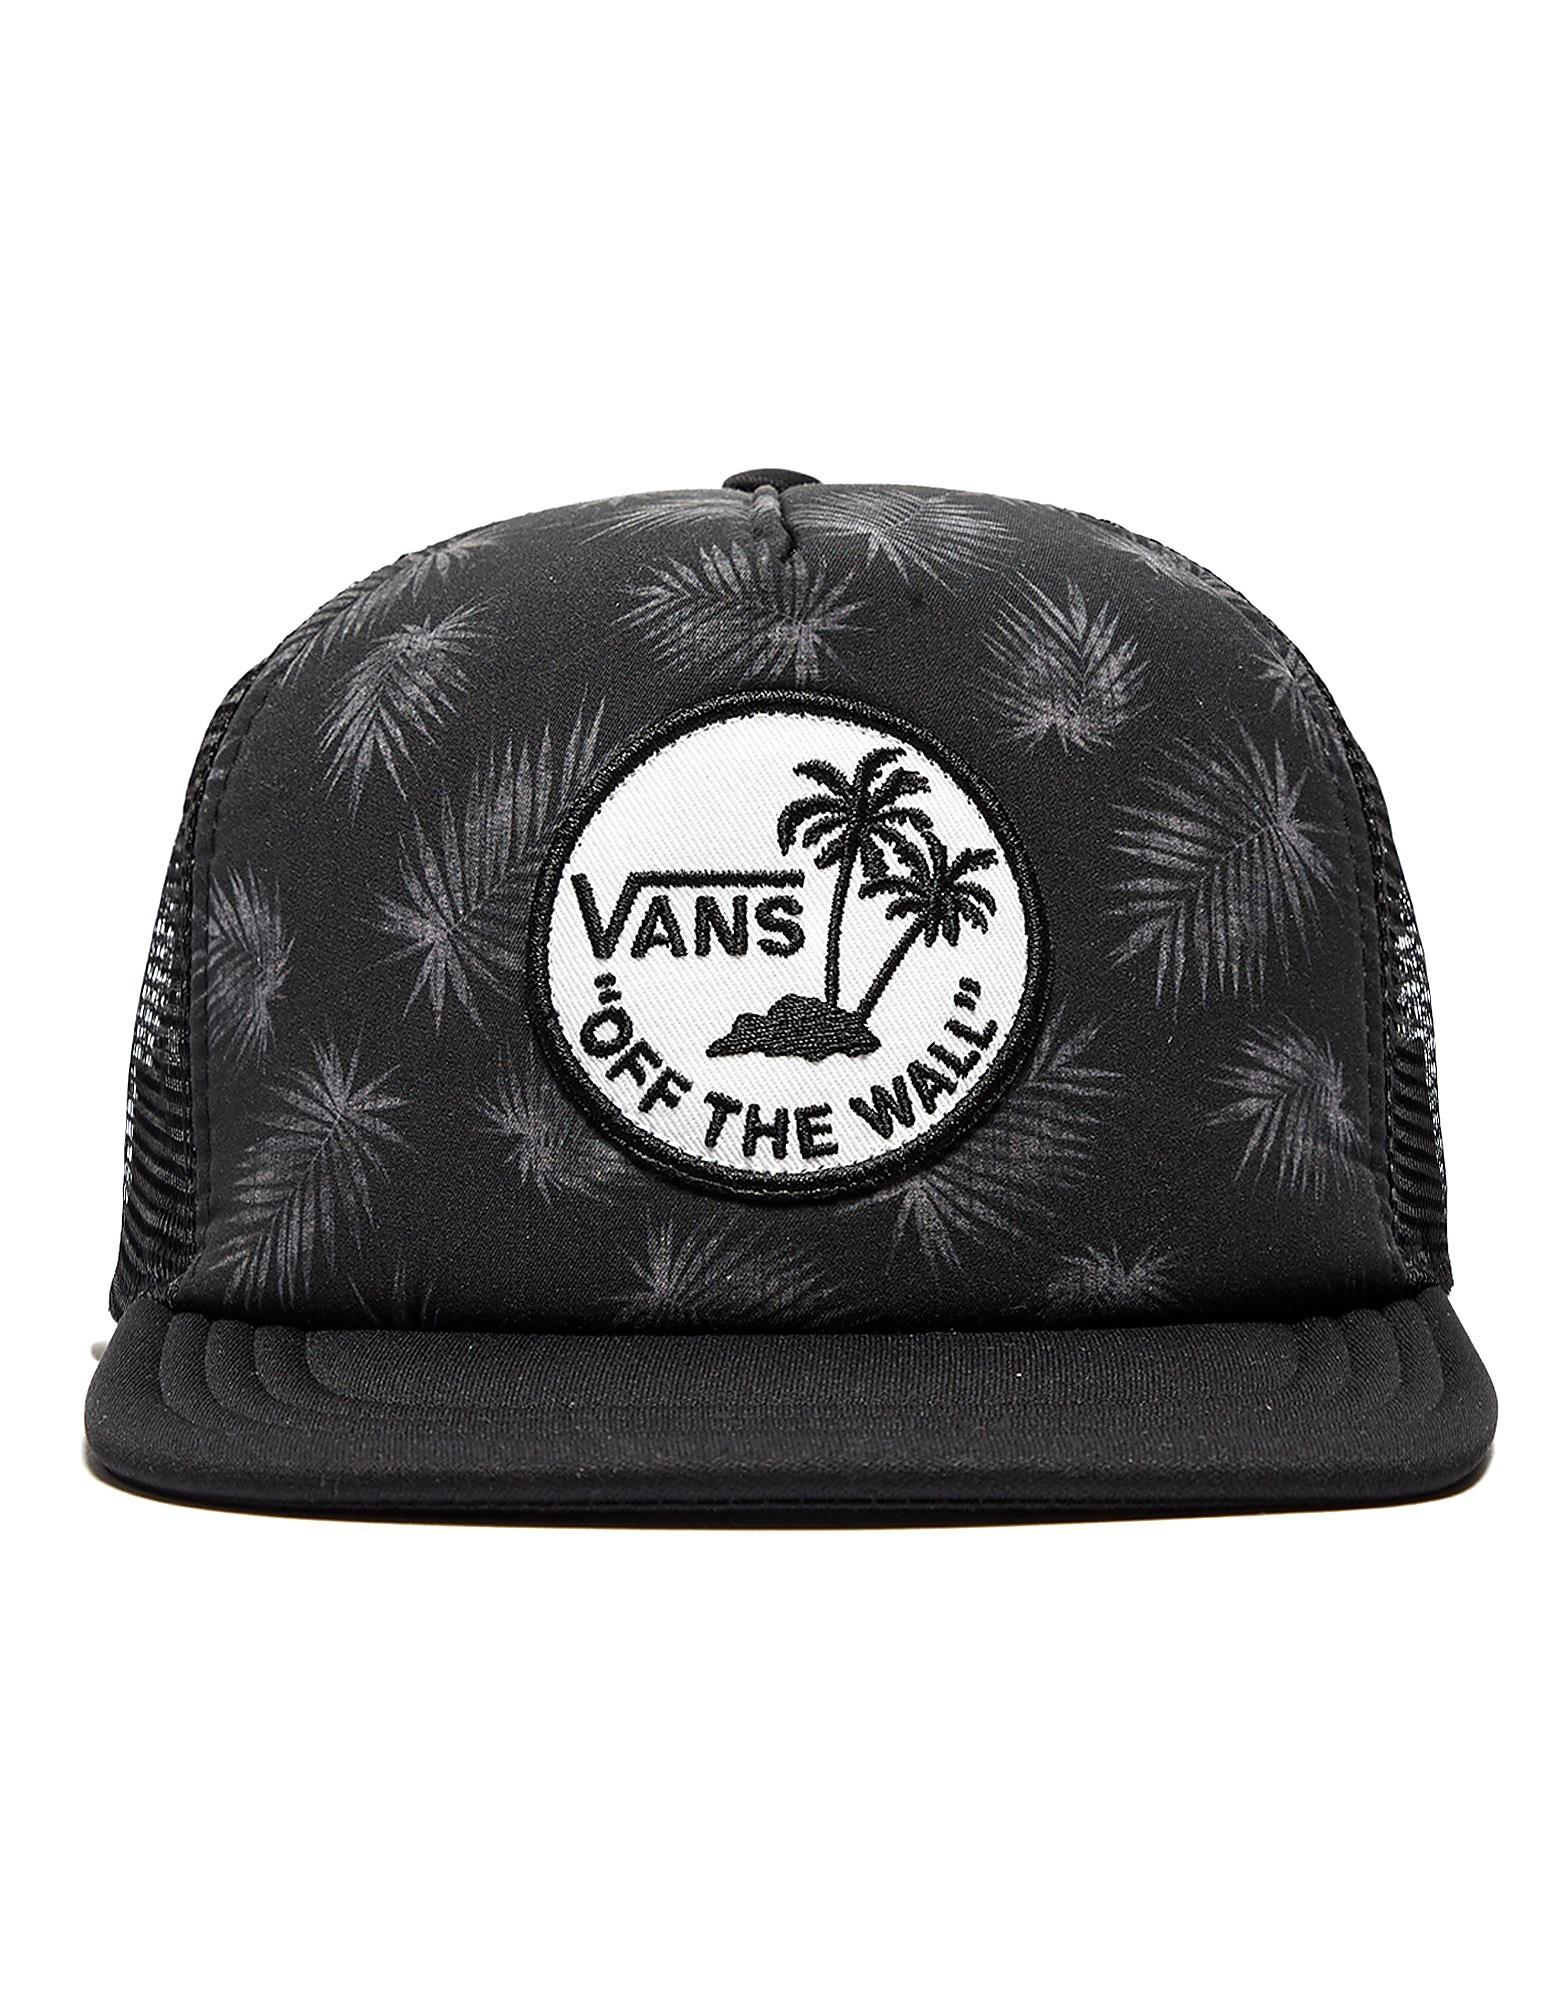 Vans Classic Patch Cap